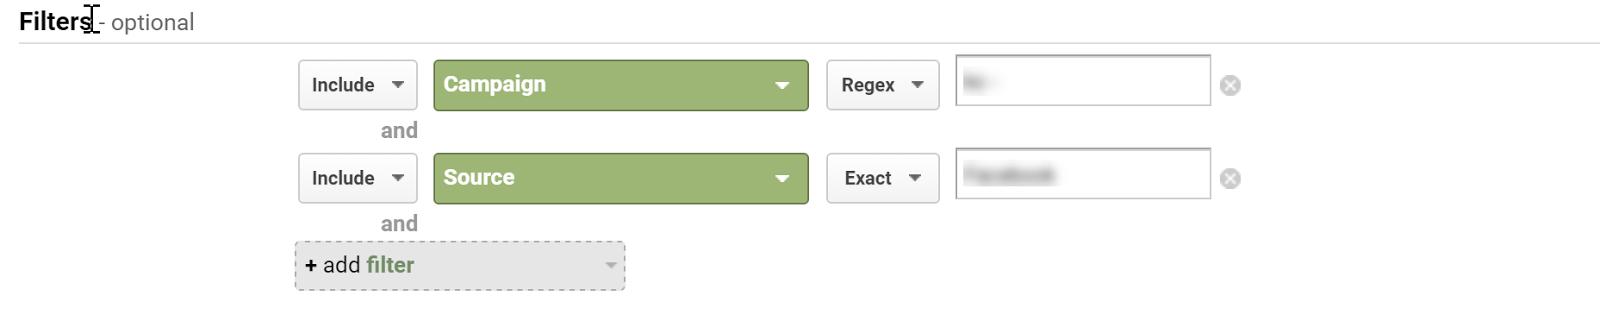 google analytics custom reports filters